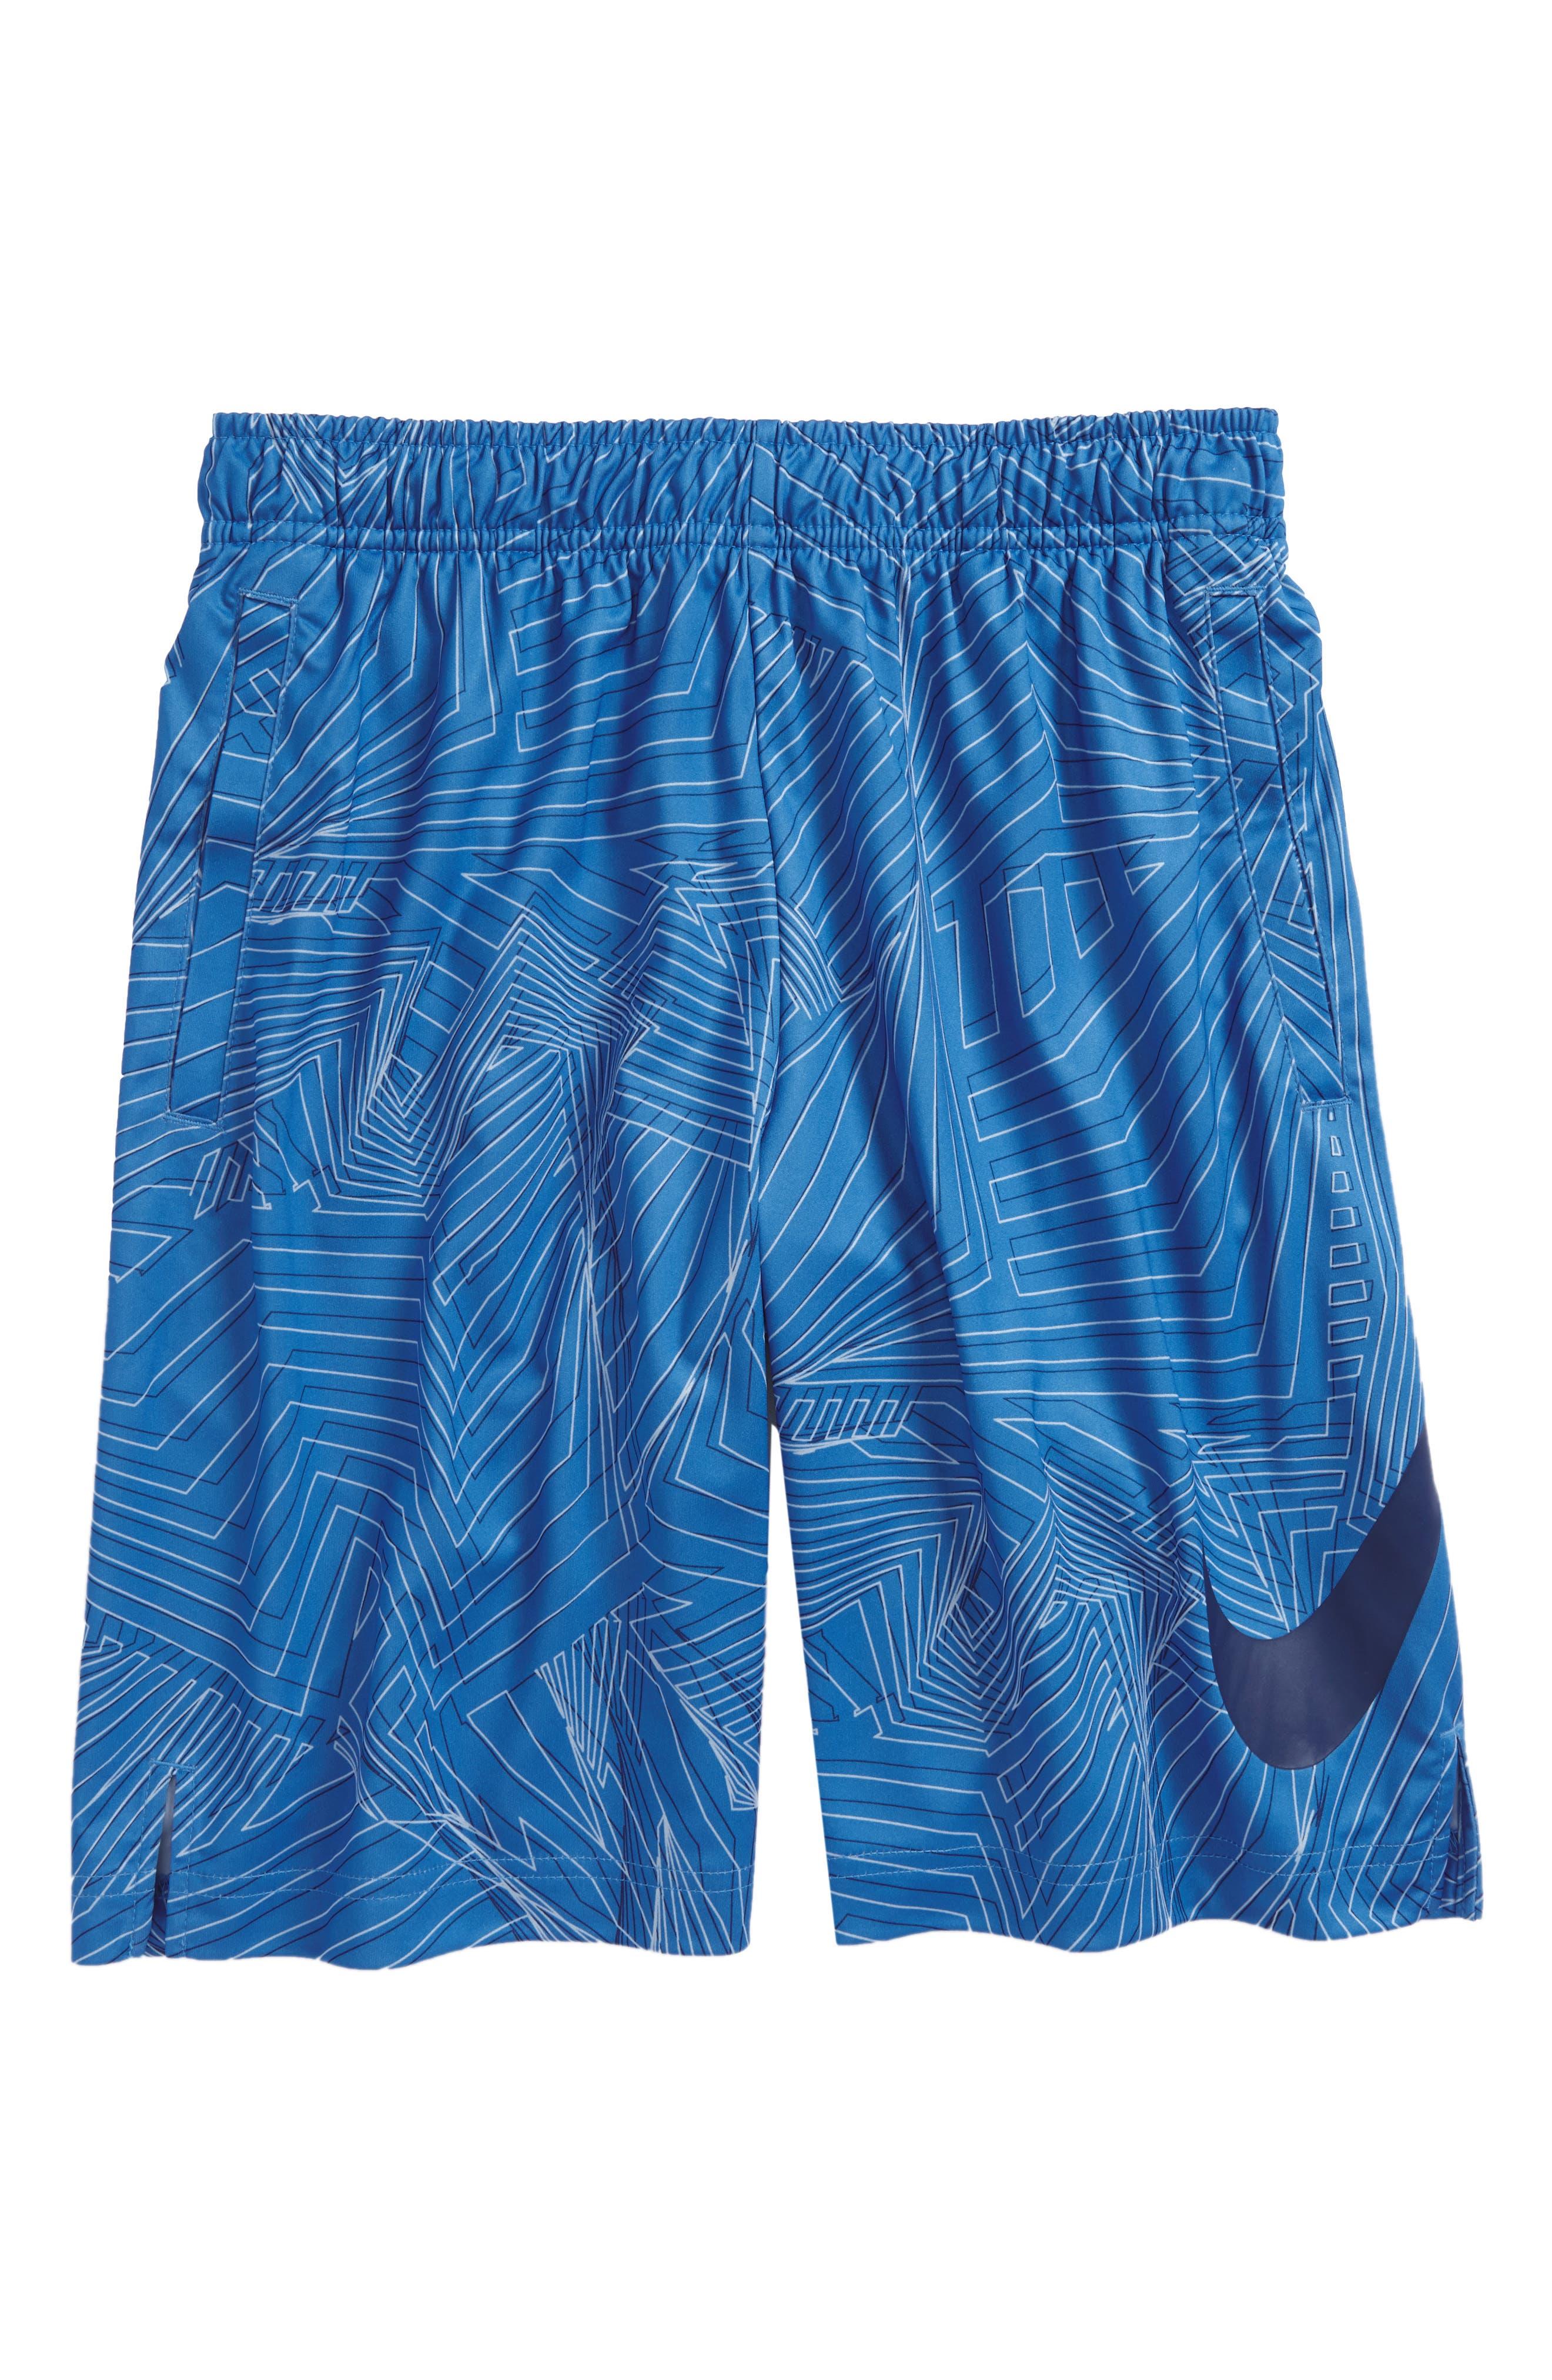 Dry Training Shorts,                             Main thumbnail 4, color,